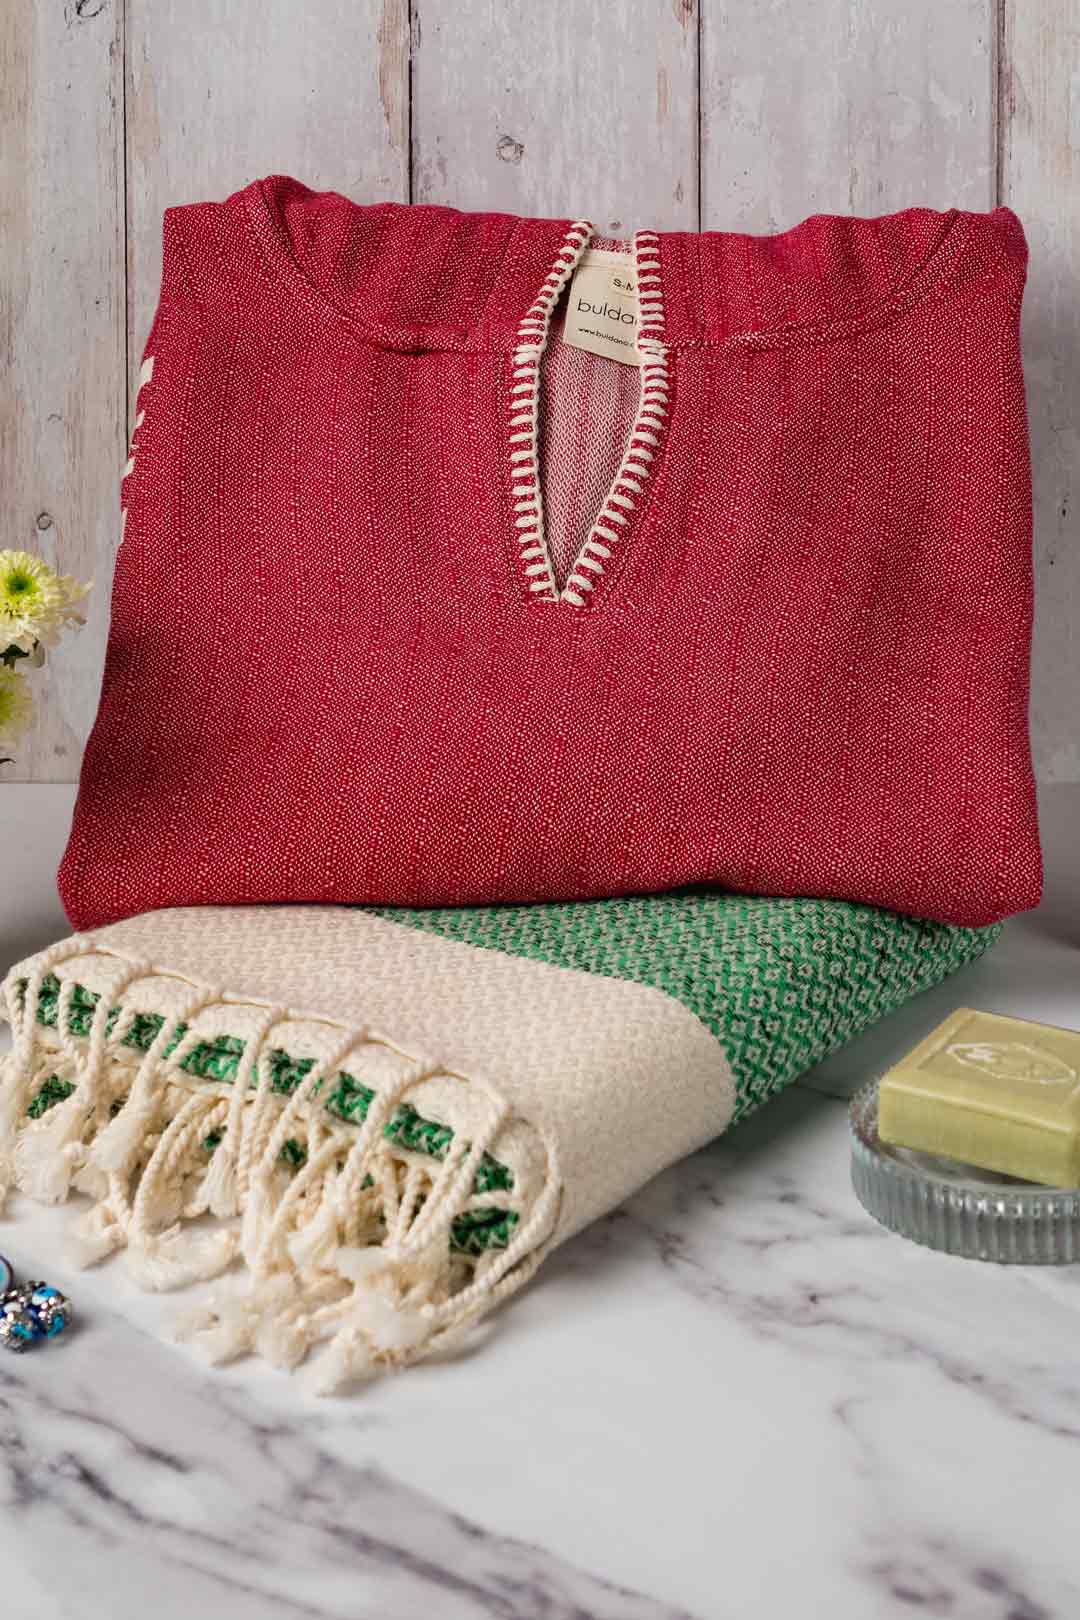 Buldano Cotton Turkish Towels